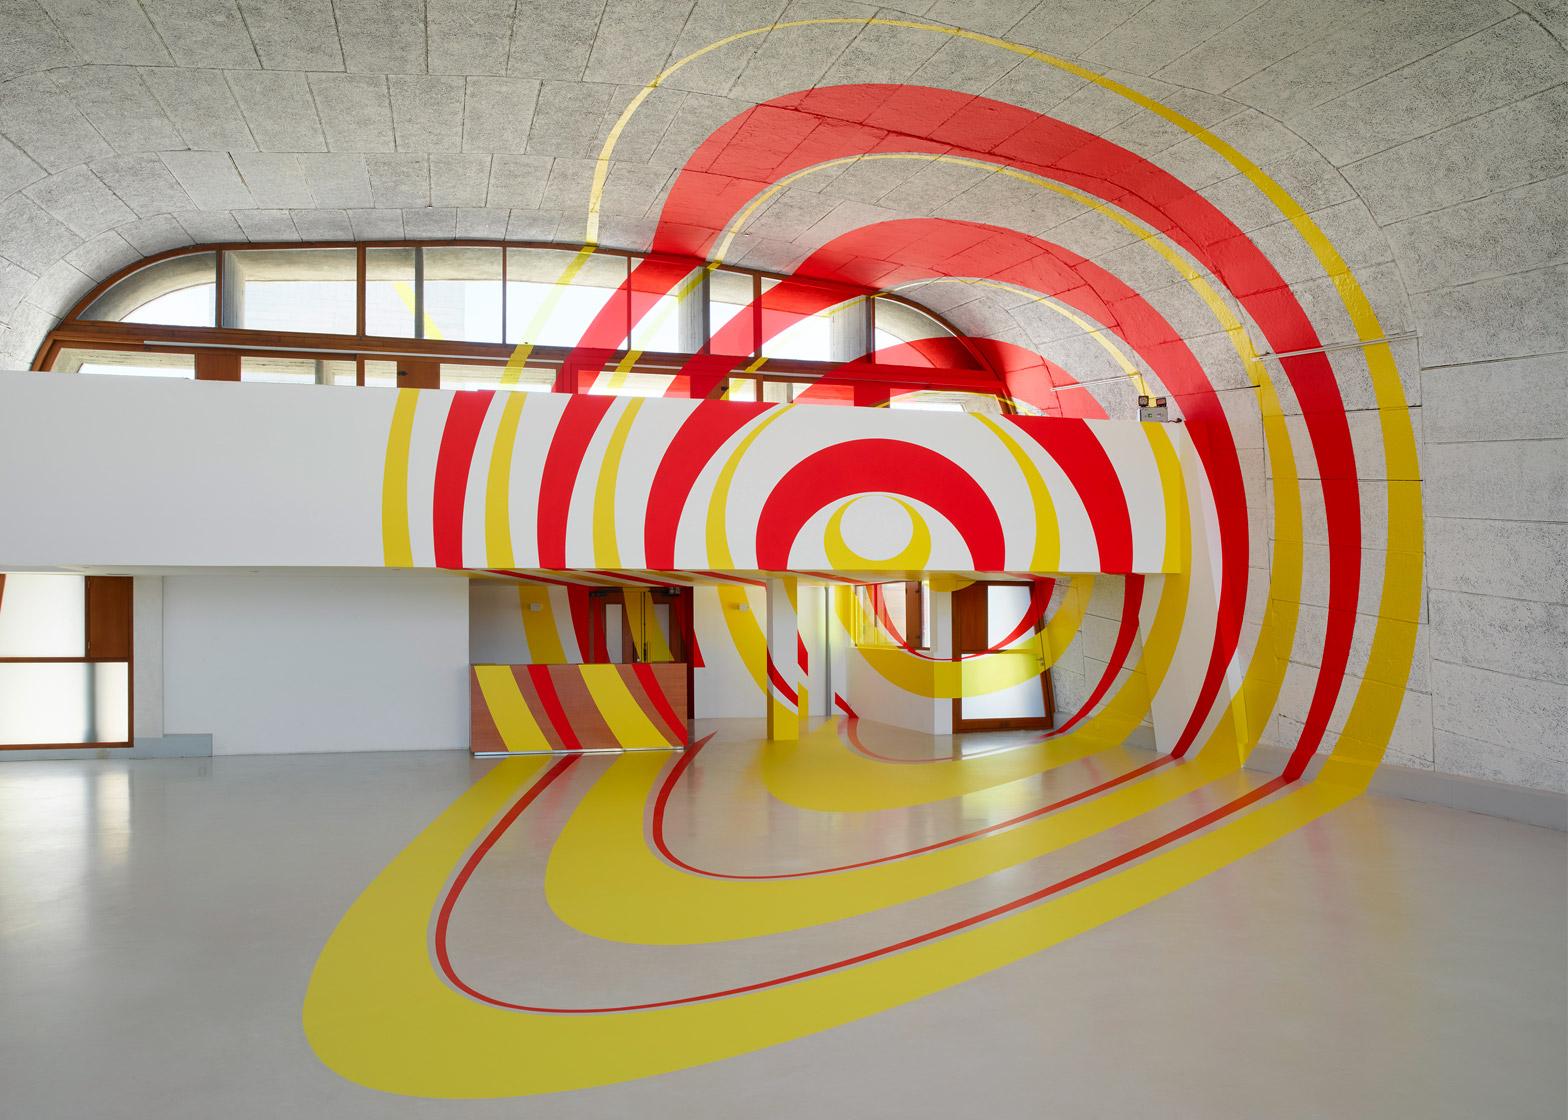 Felice Varini transforms rooftop of Le Corbusier's MAMO into optical illusion